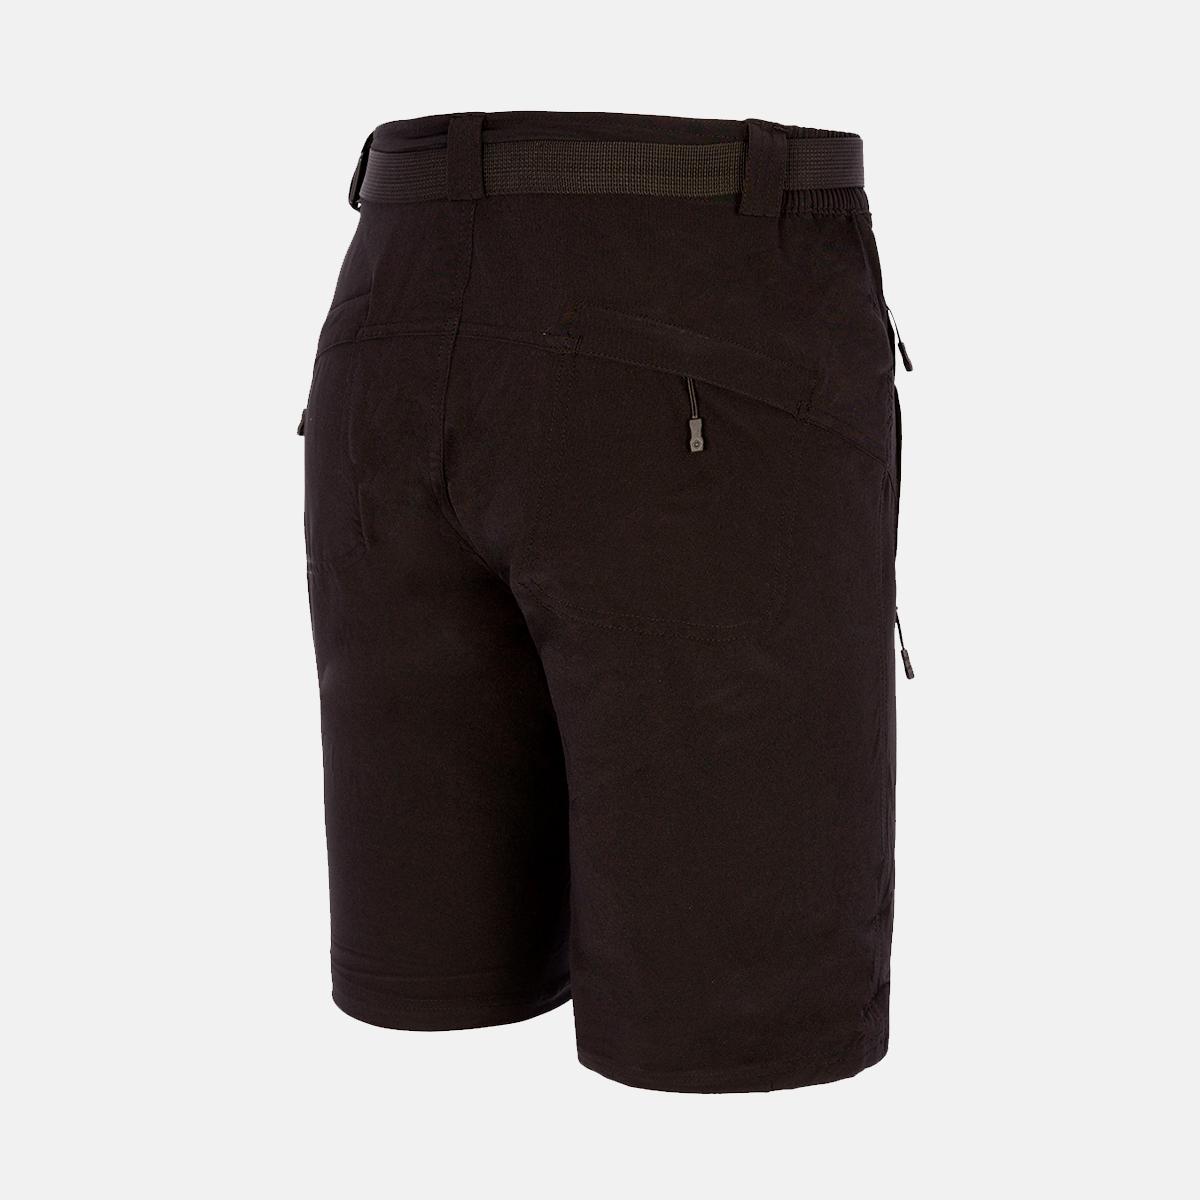 MAN'S BEAR STRETCH SHORT PANT BLACK